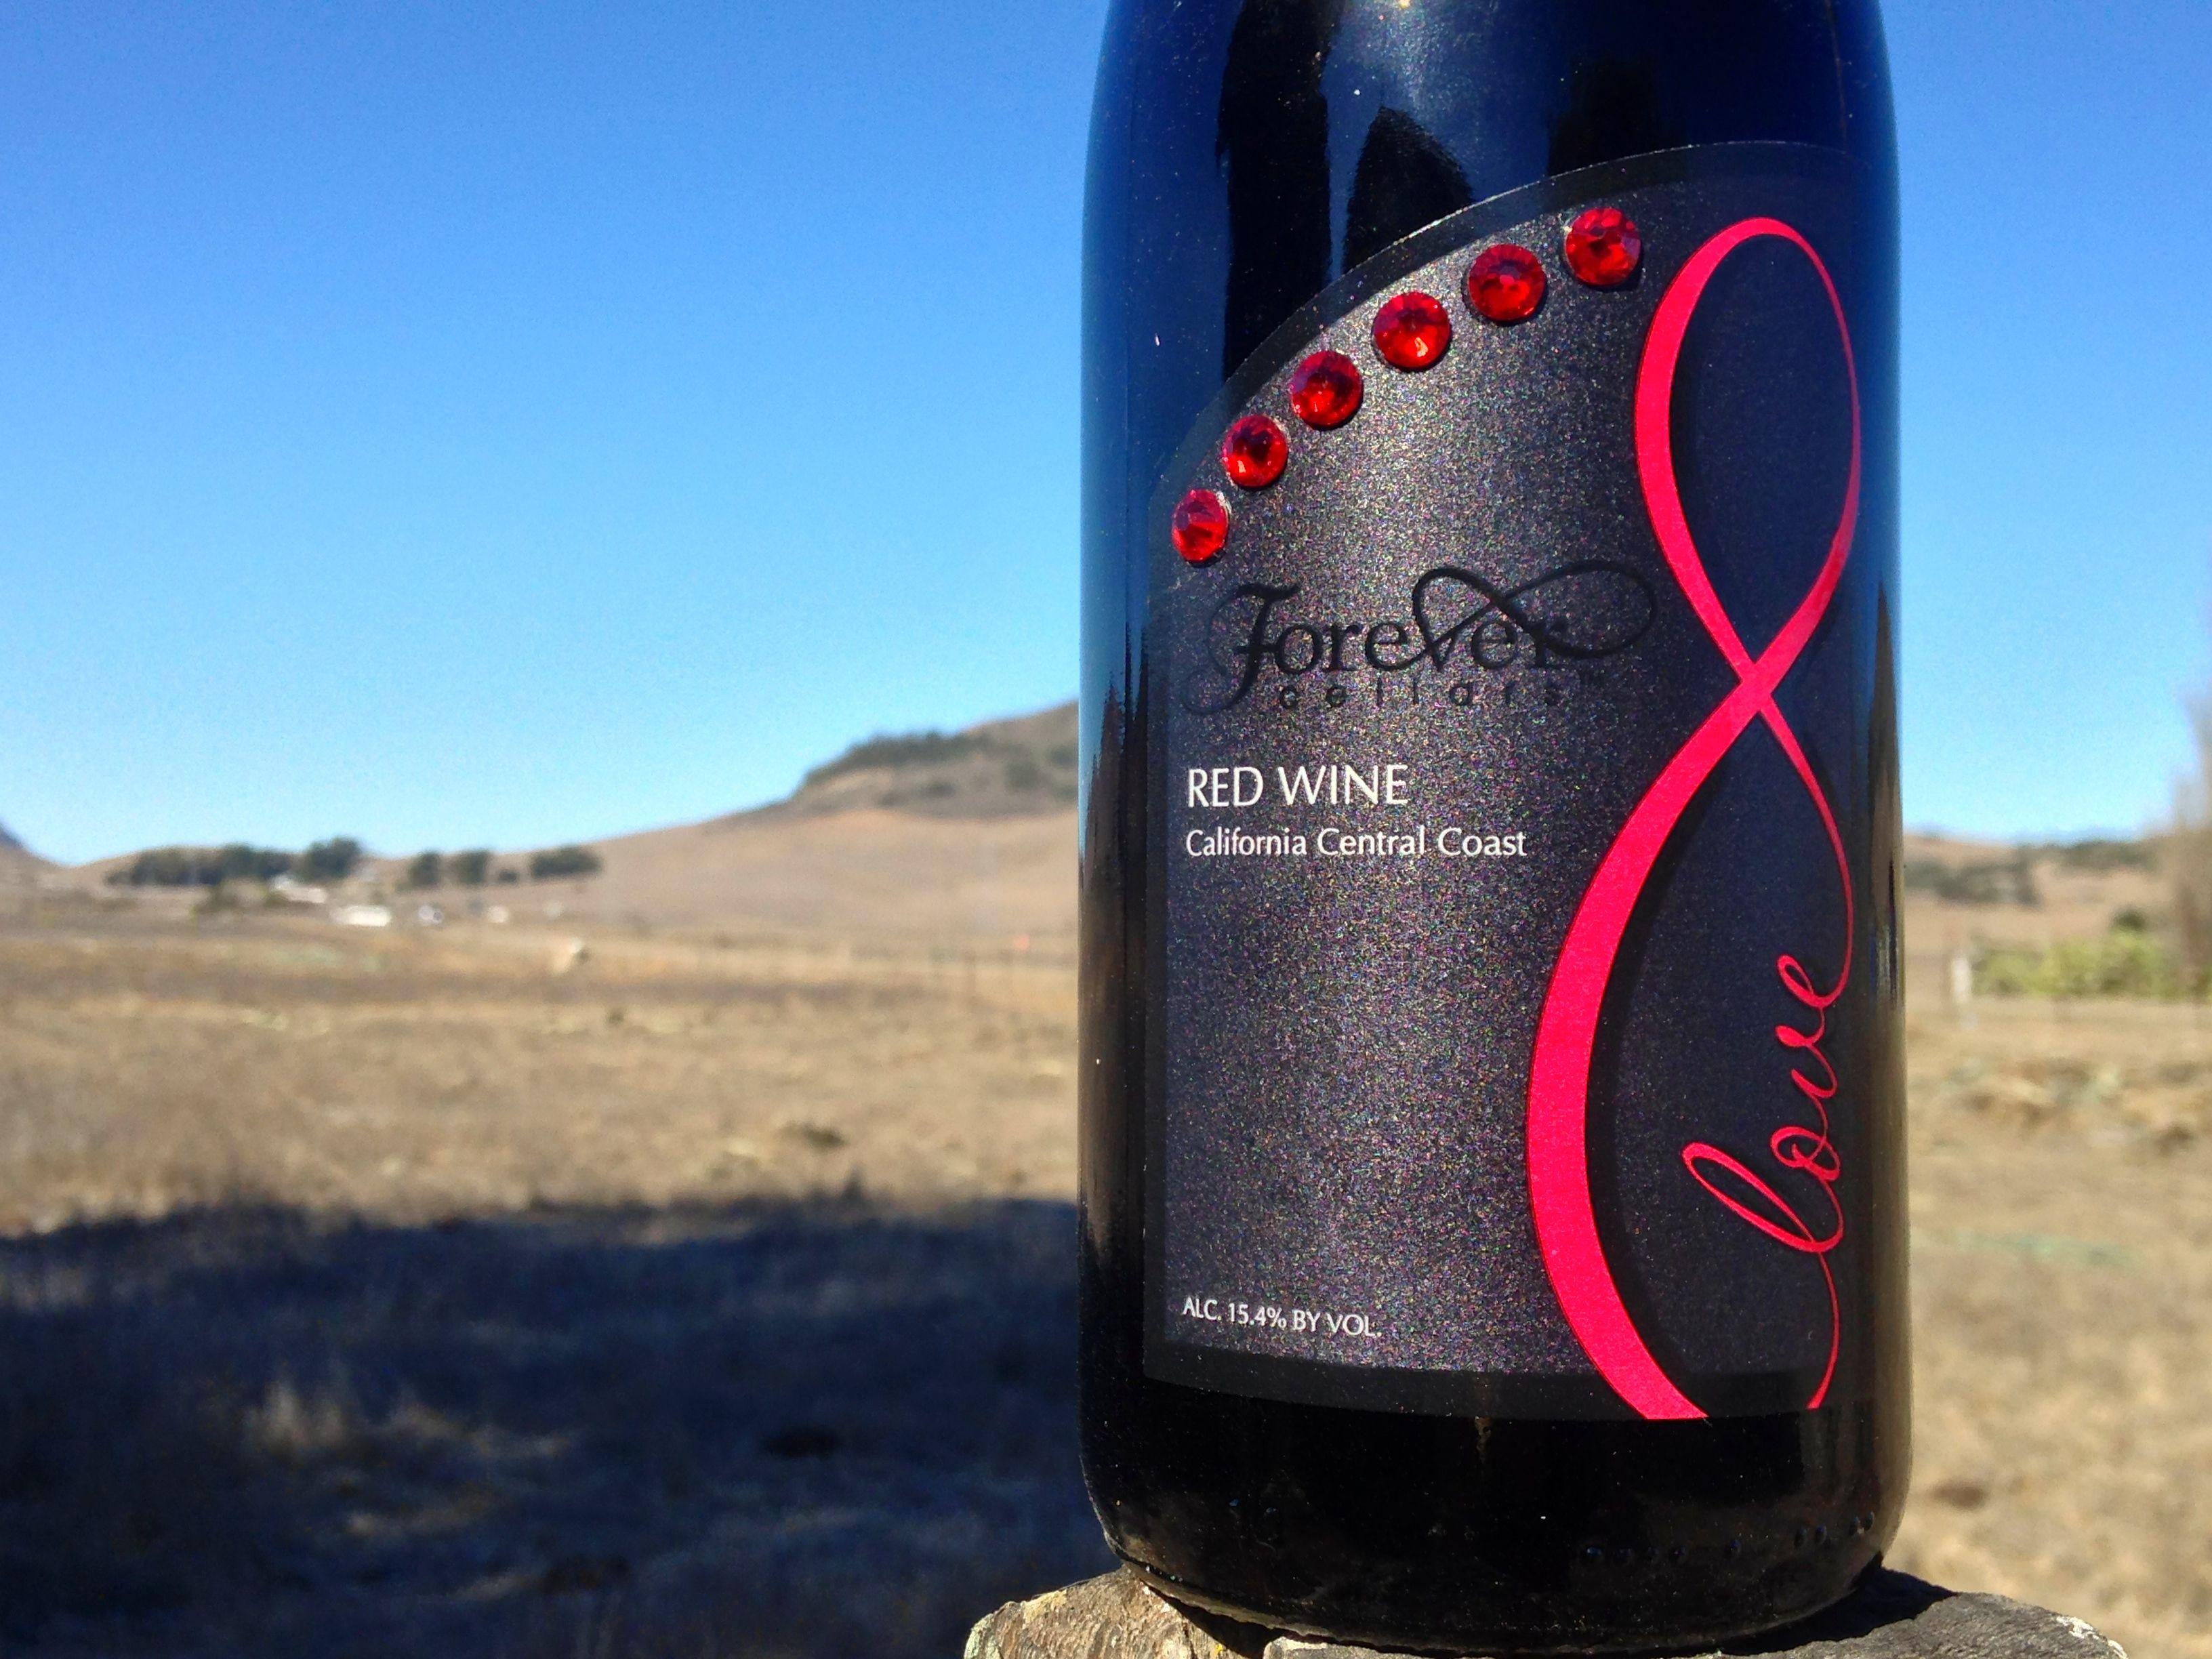 Forever Love Wine Www Forevercellars Com Red Wine Beverage Can Wine Bottle